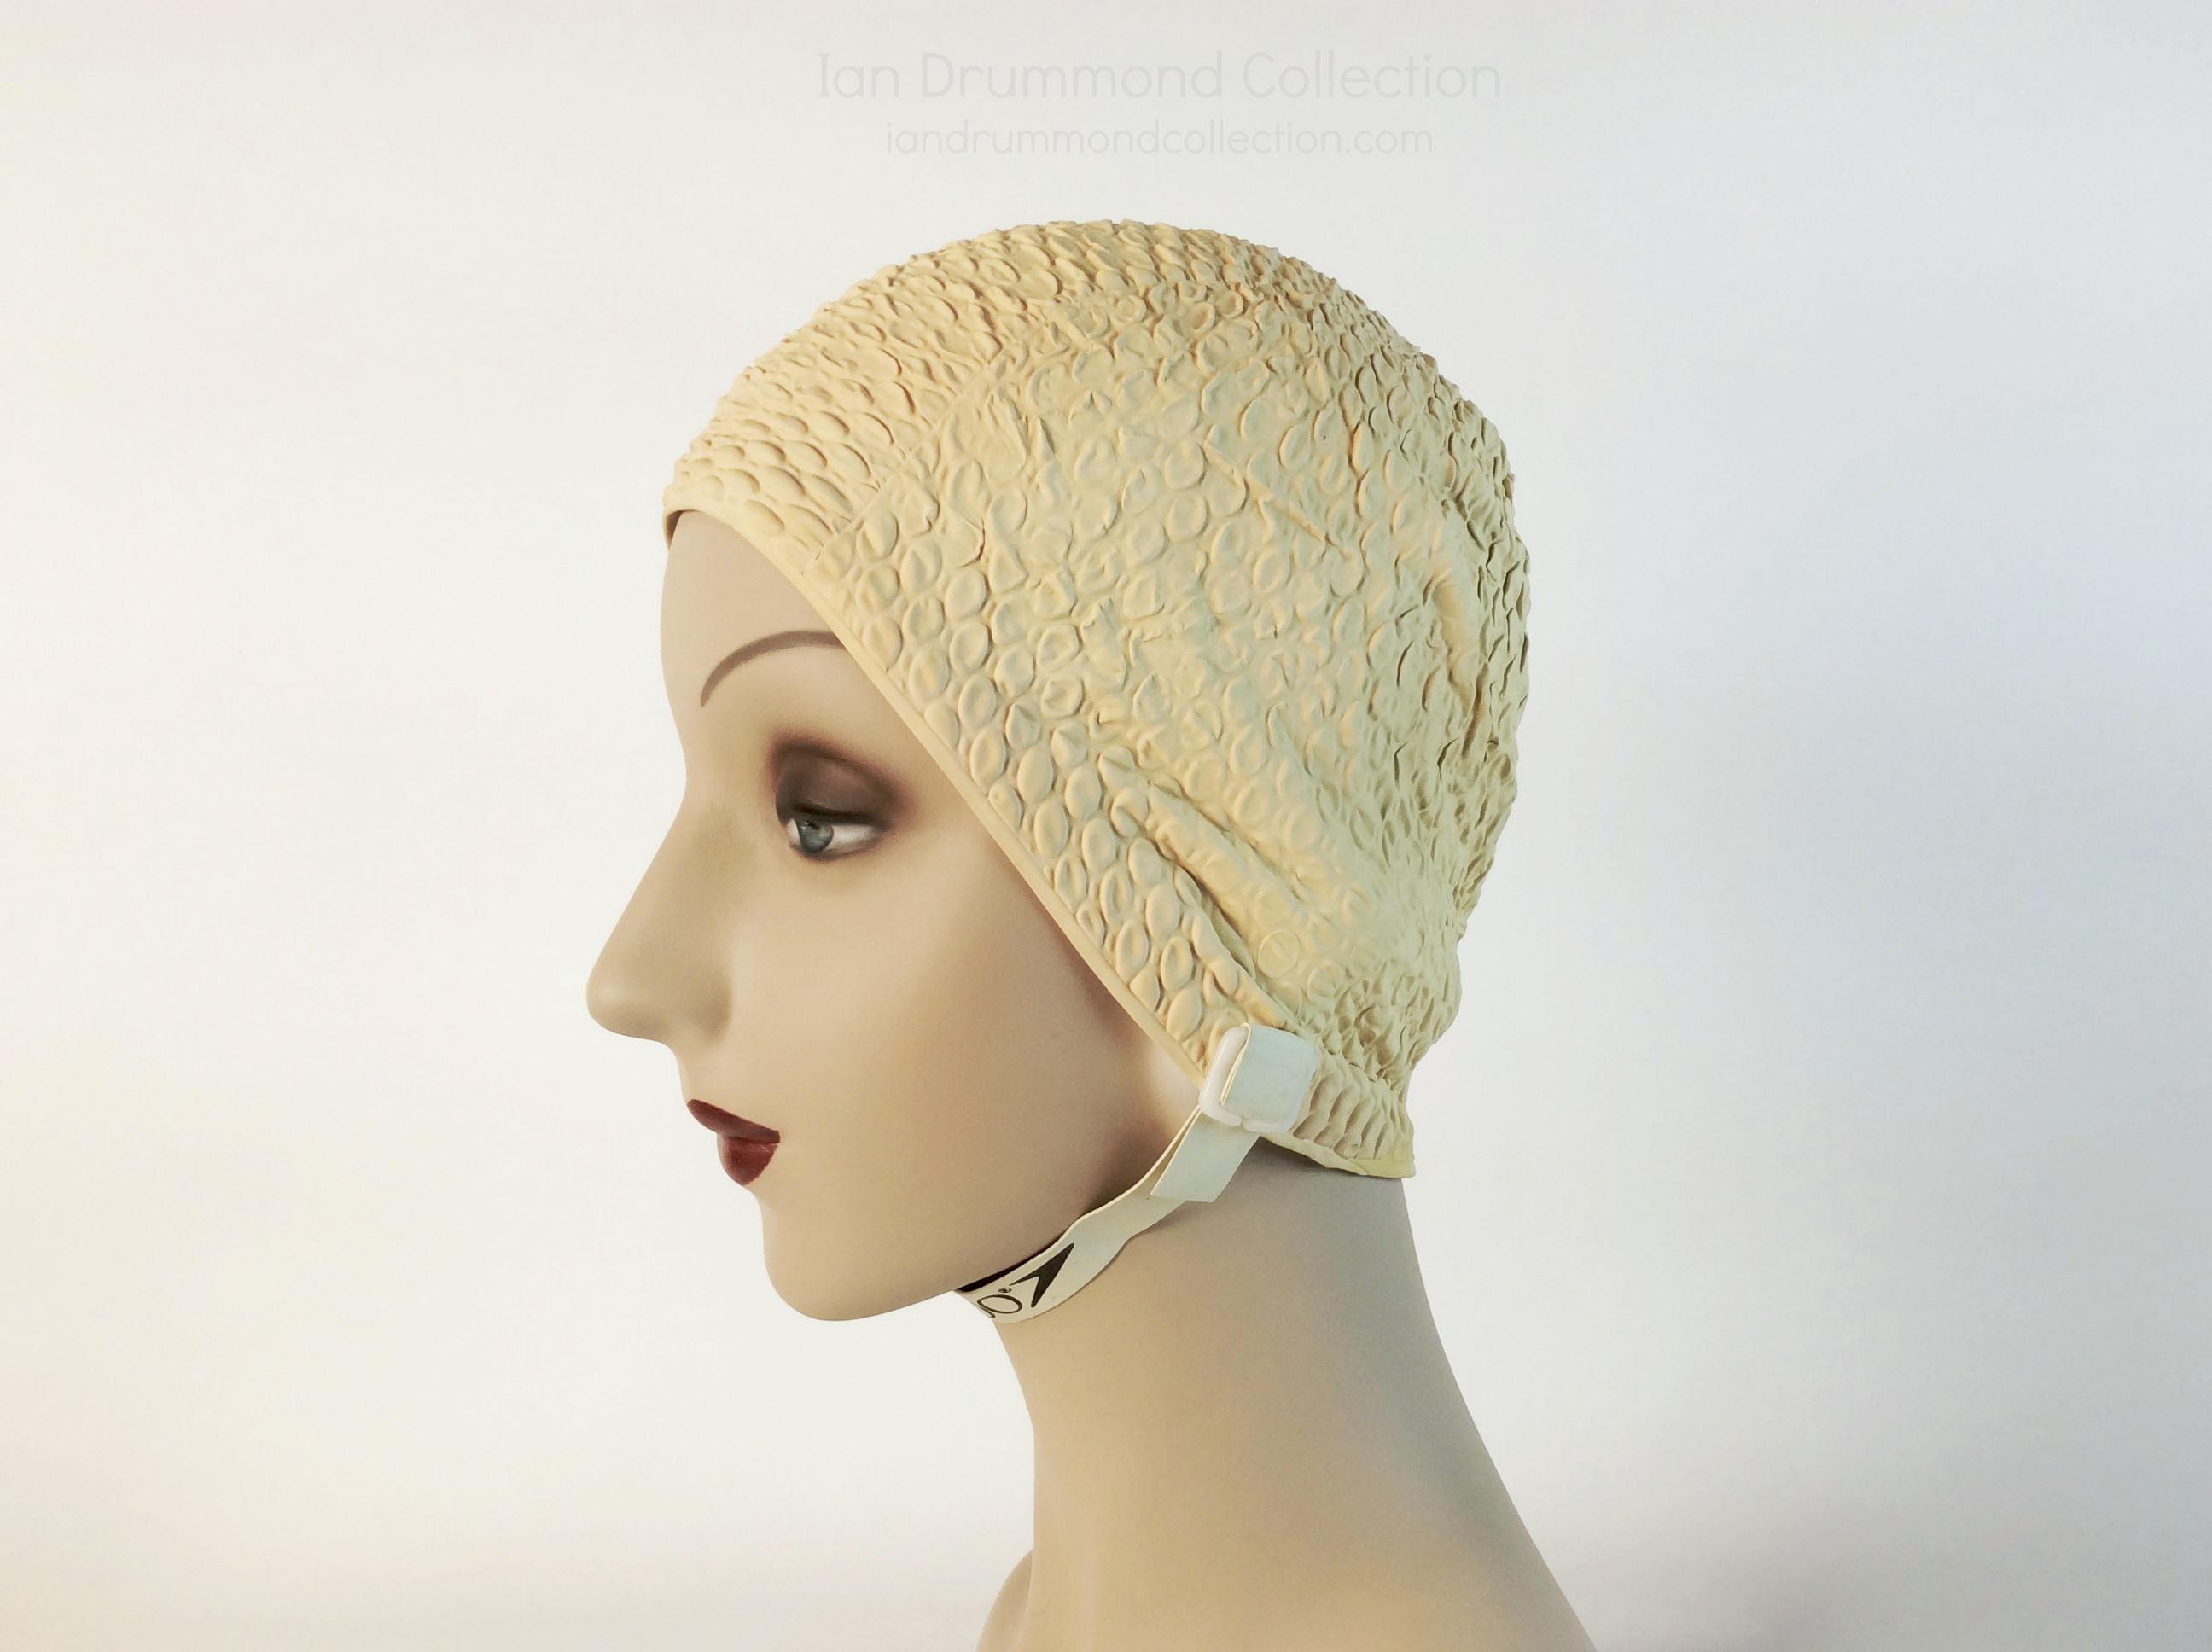 IDC Movie Wardrobe Rental Swim Cap 23 Creamy Pink with Bubble Wrap Design, replacement strap